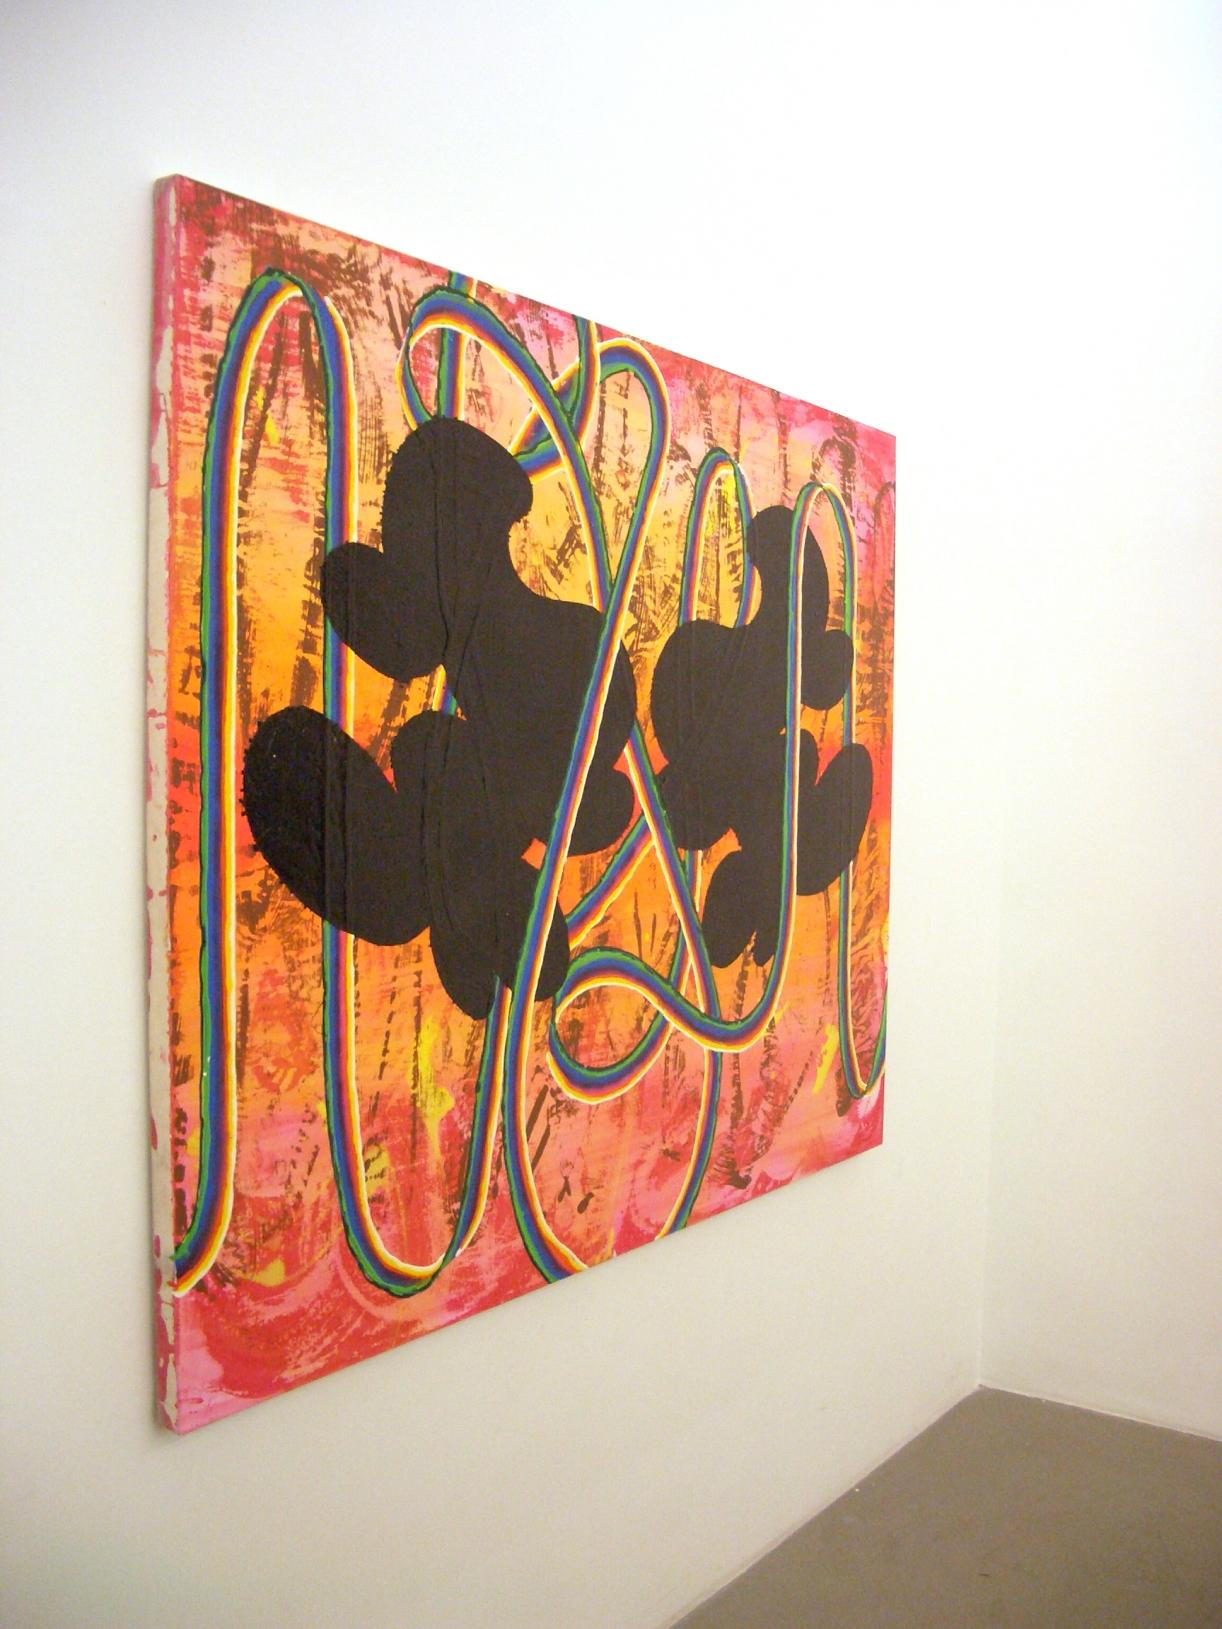 Christine Streuli, Dicht dran, Exhibition view, Hamburg, 2005